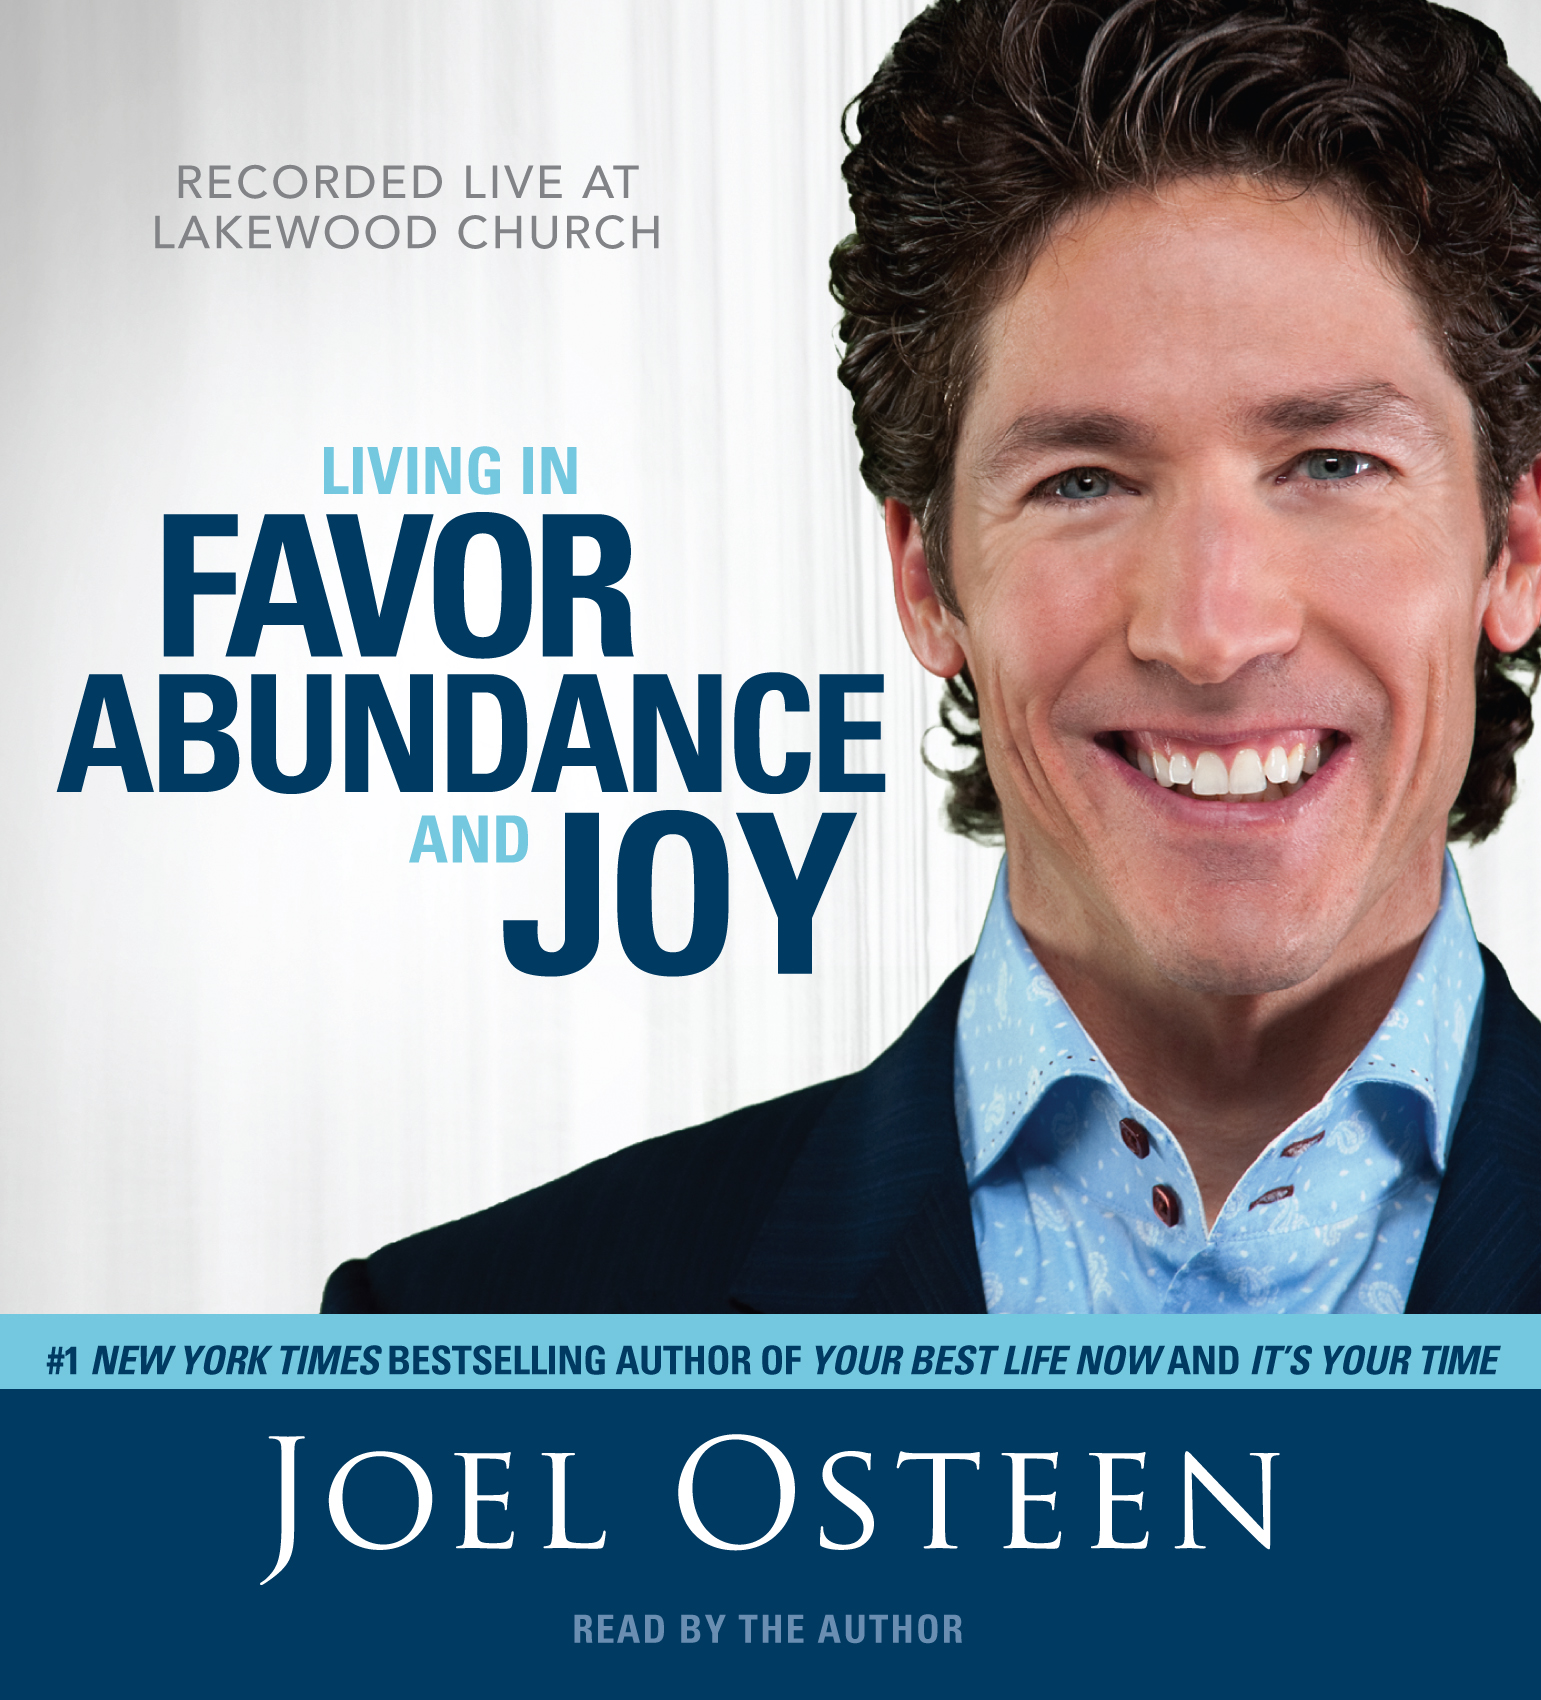 Living In Favor Abundance And Joy Audiobook By Joel Osteen